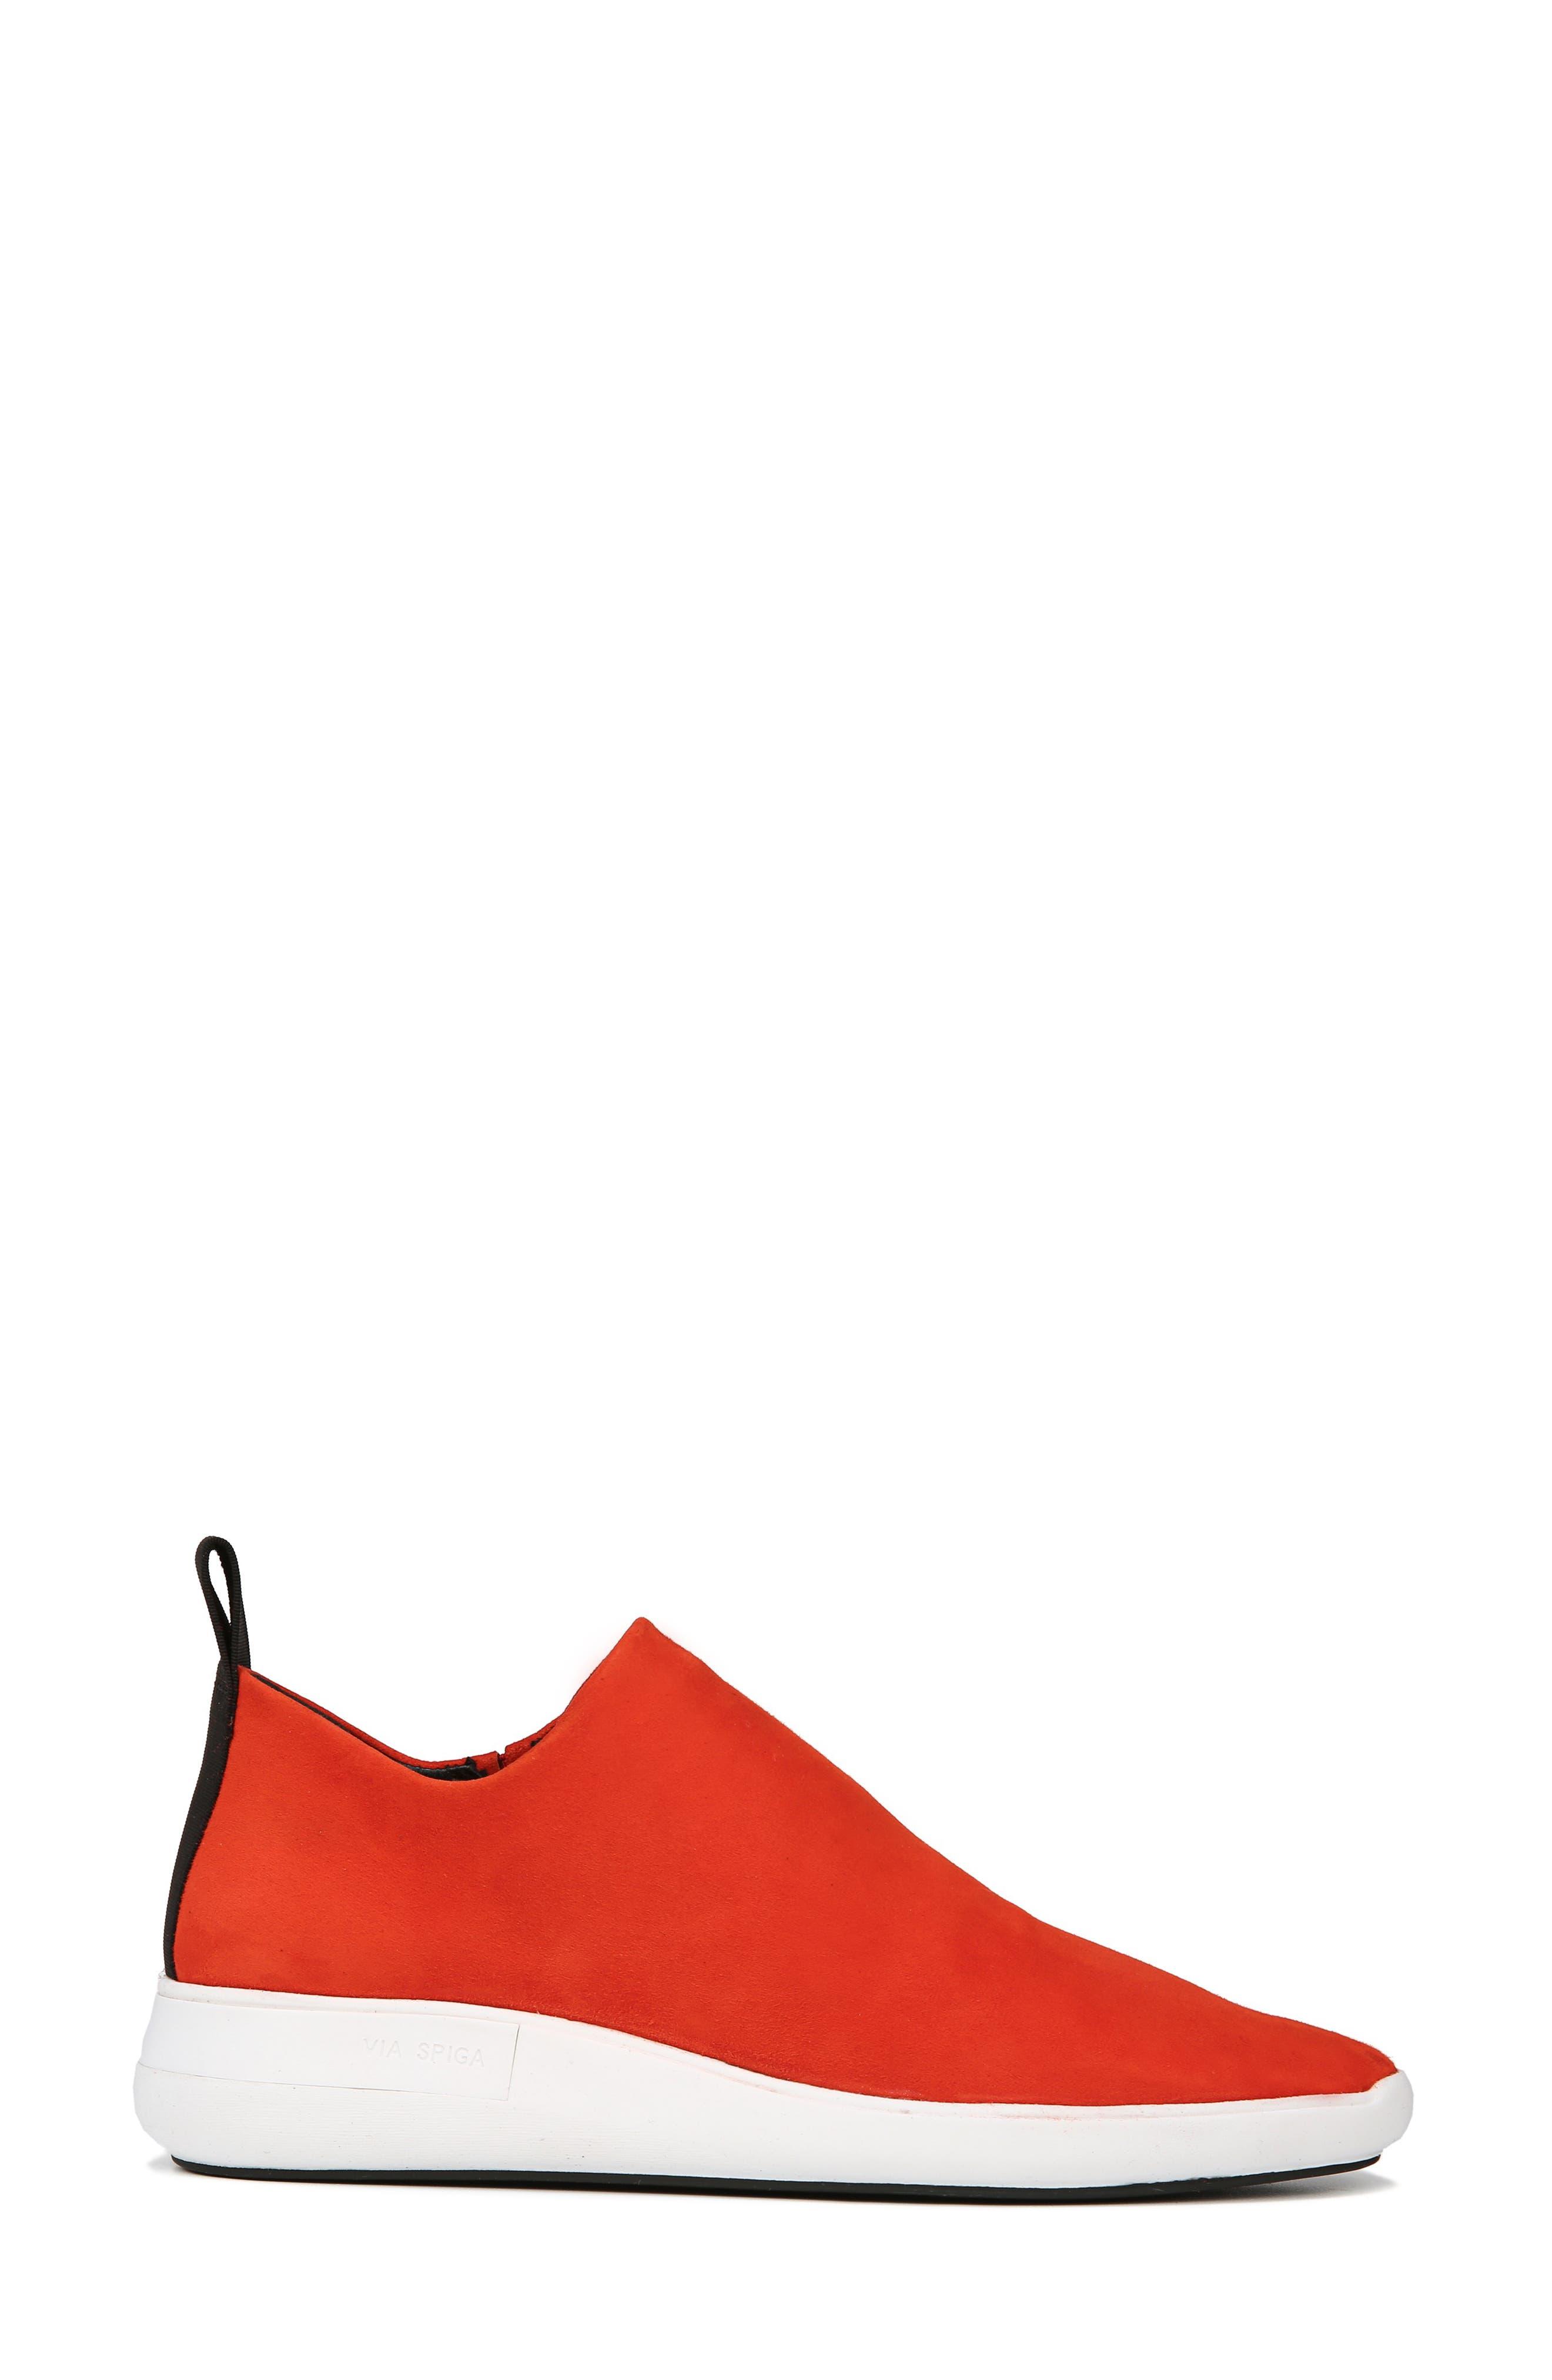 Marlow Slip-On Sneaker,                             Alternate thumbnail 3, color,                             SIENNA